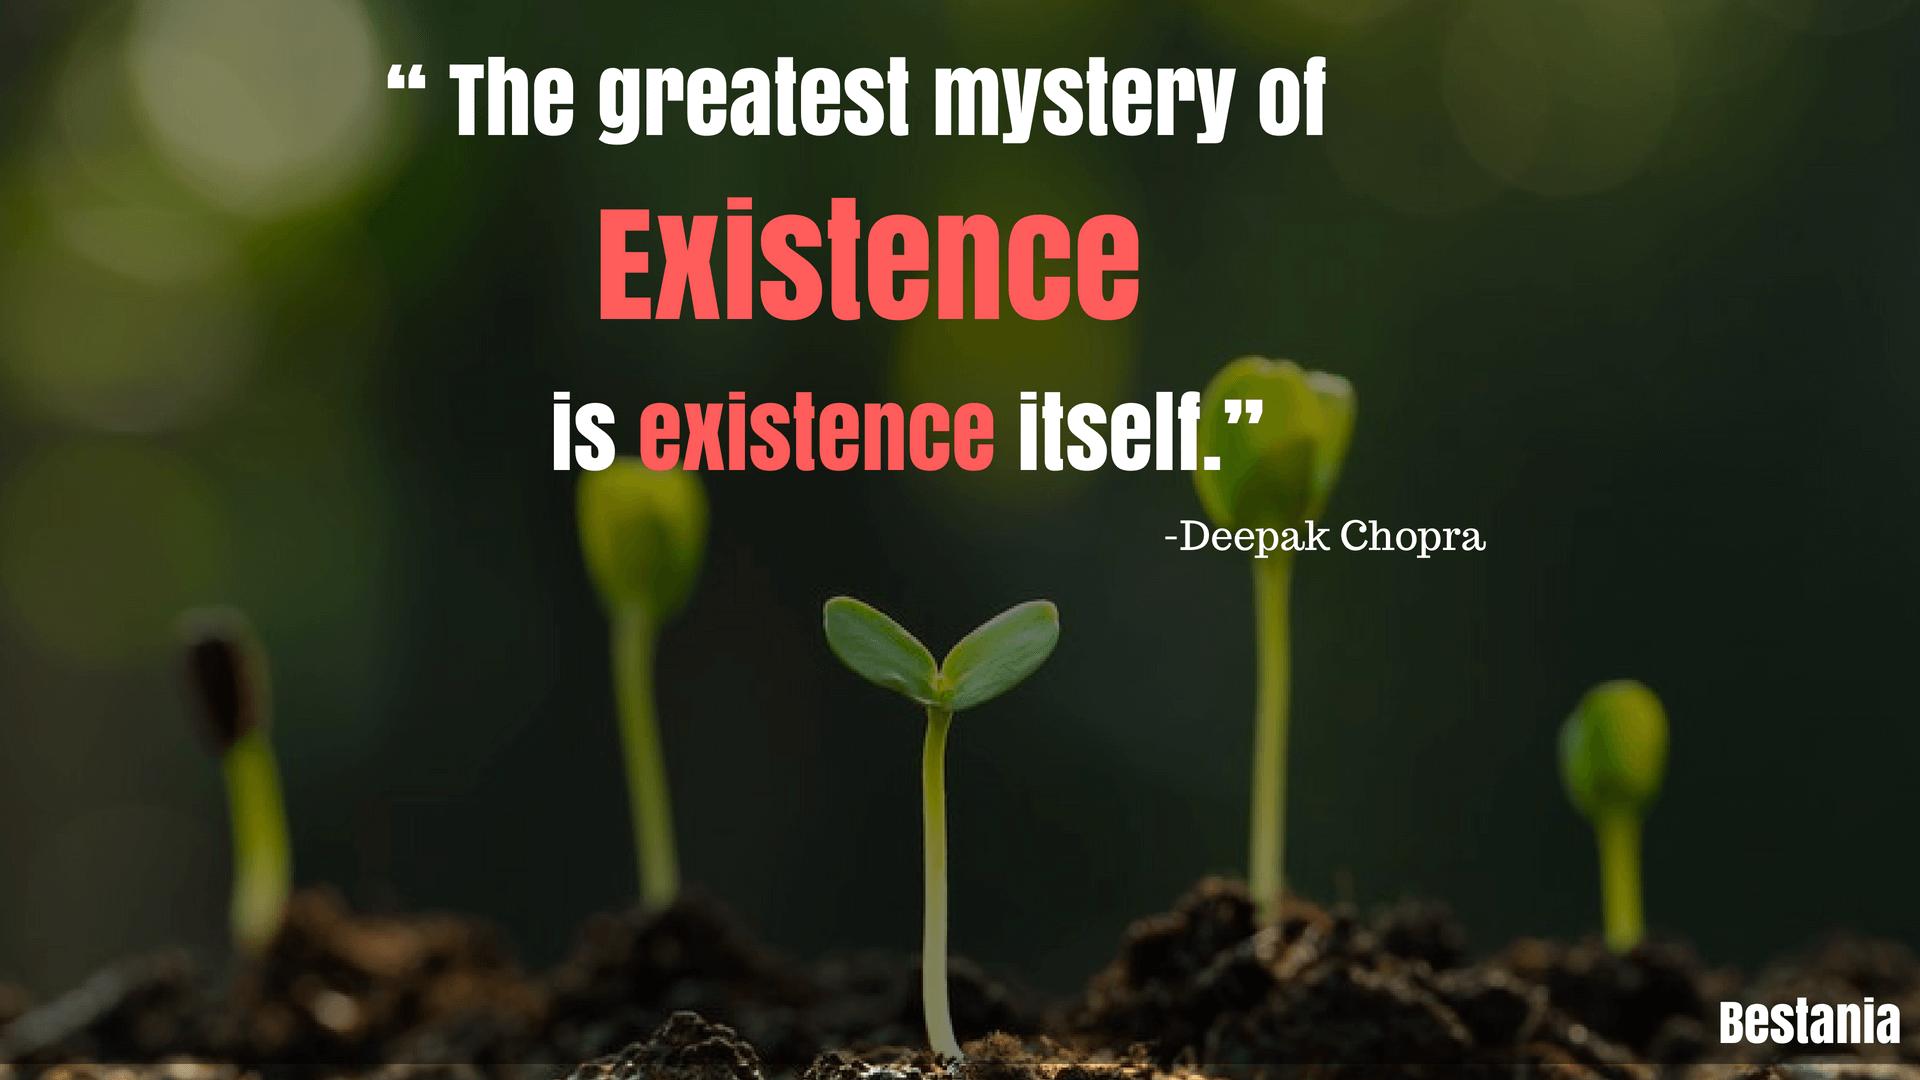 """THE GREATEST MYSTERY OF EXISTENCE IS EXISTENCE ITSELF.""– DEEPAK CHOPRA"